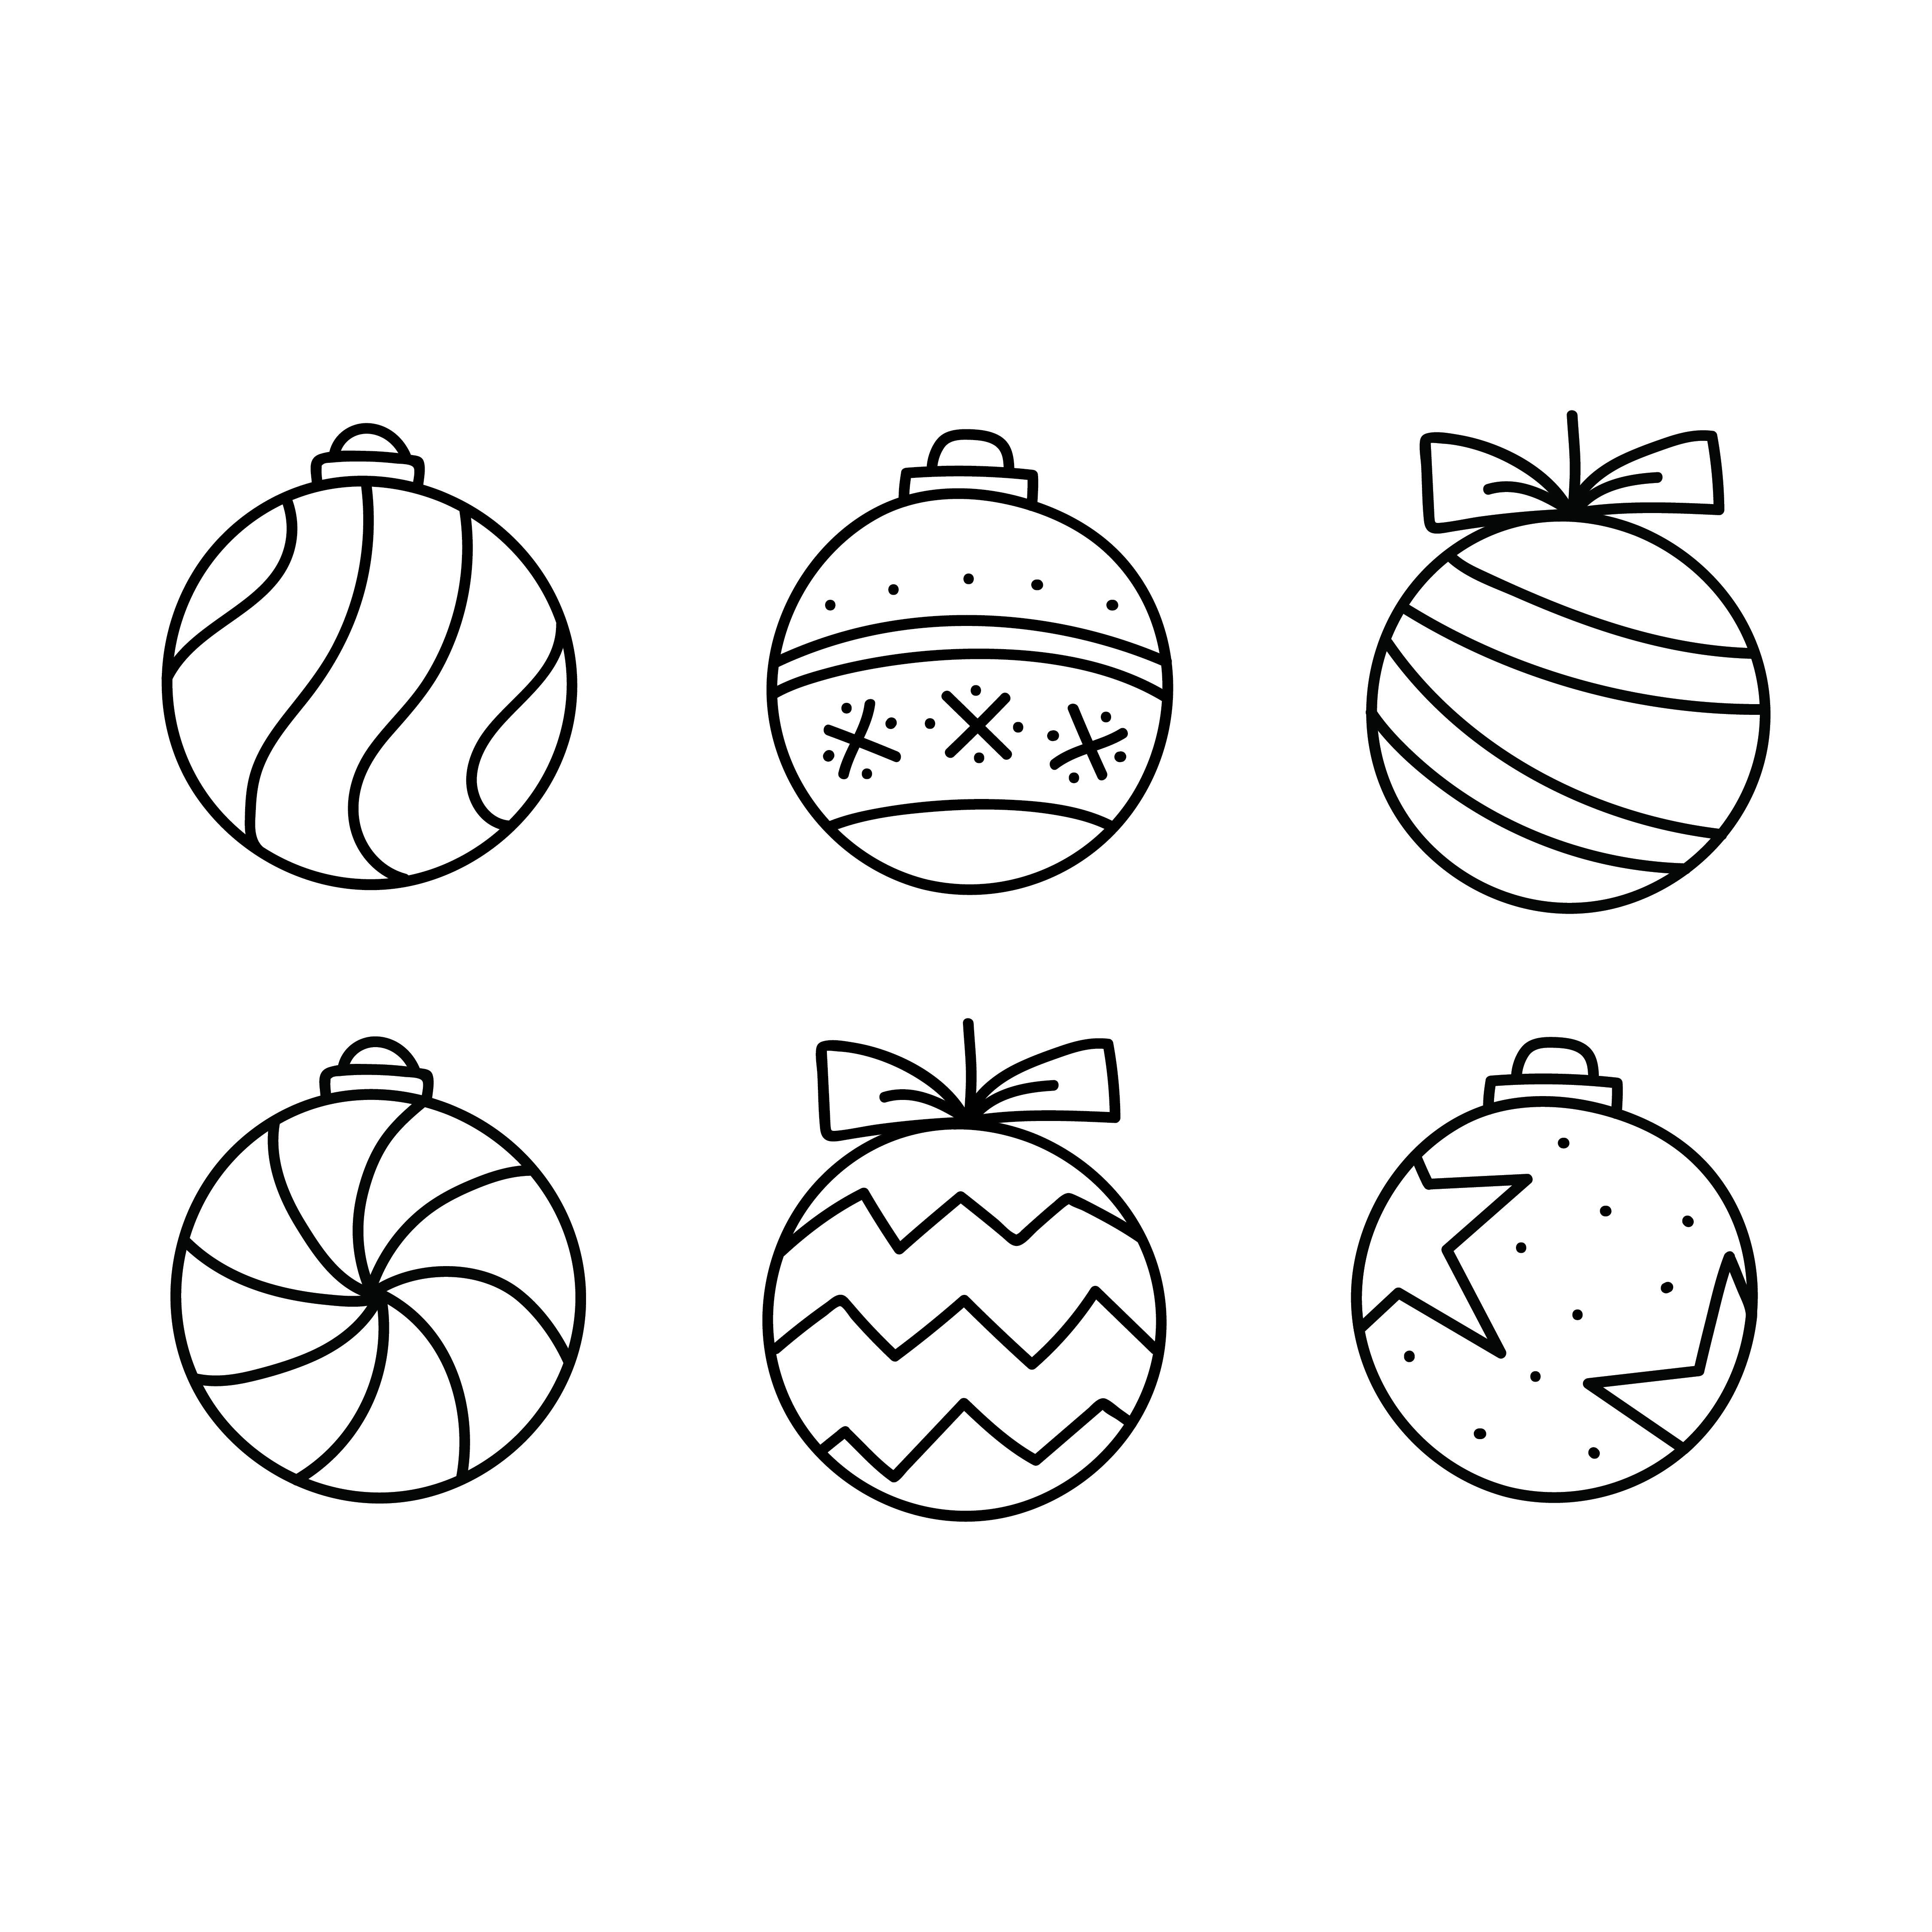 Printable Felt Christmas Ornament Templates